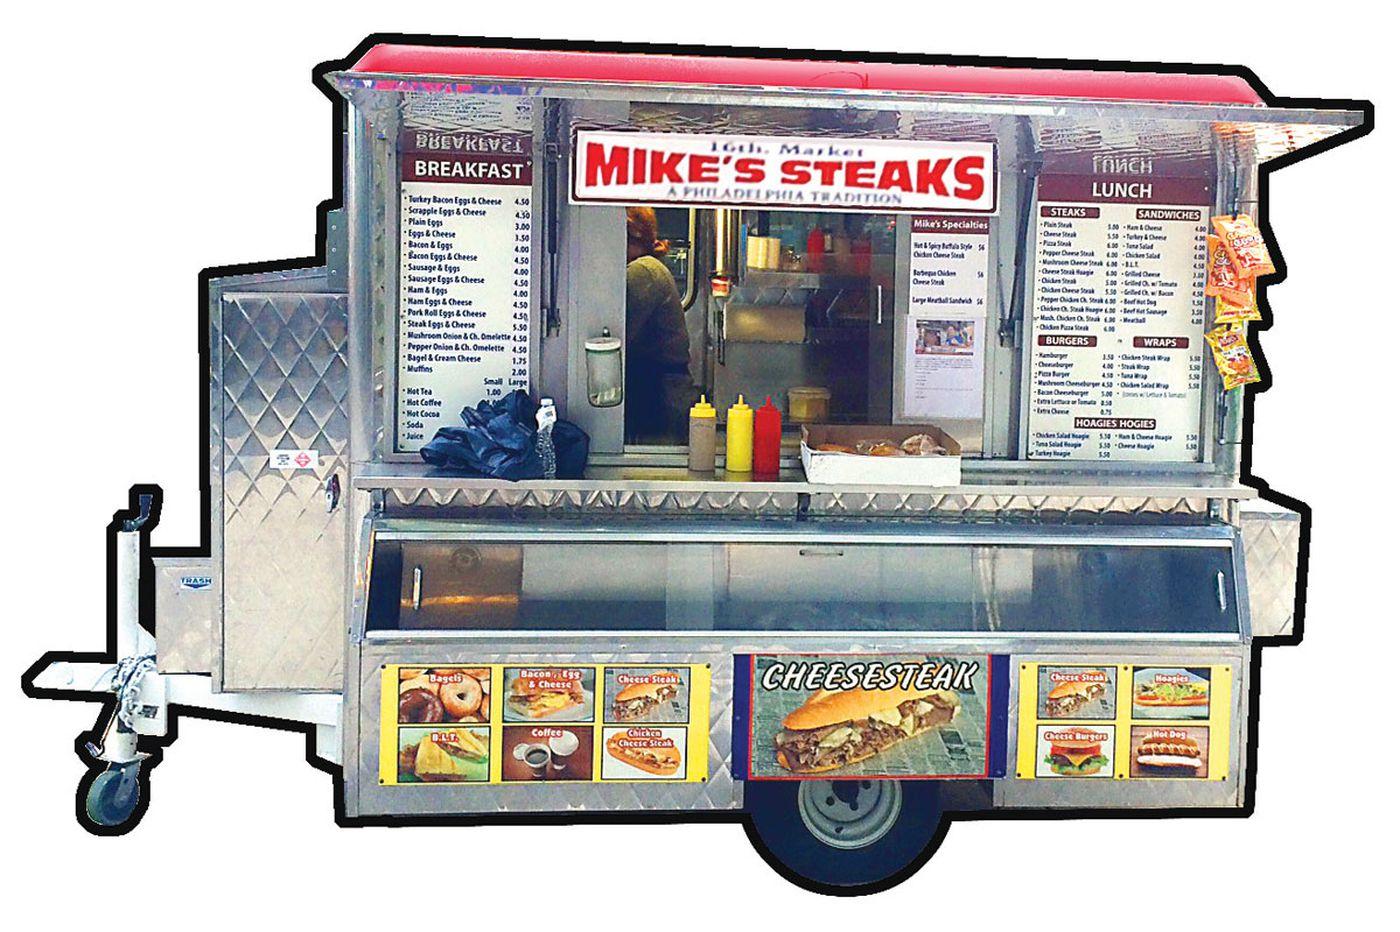 Truck Stop: Mike's Steaks